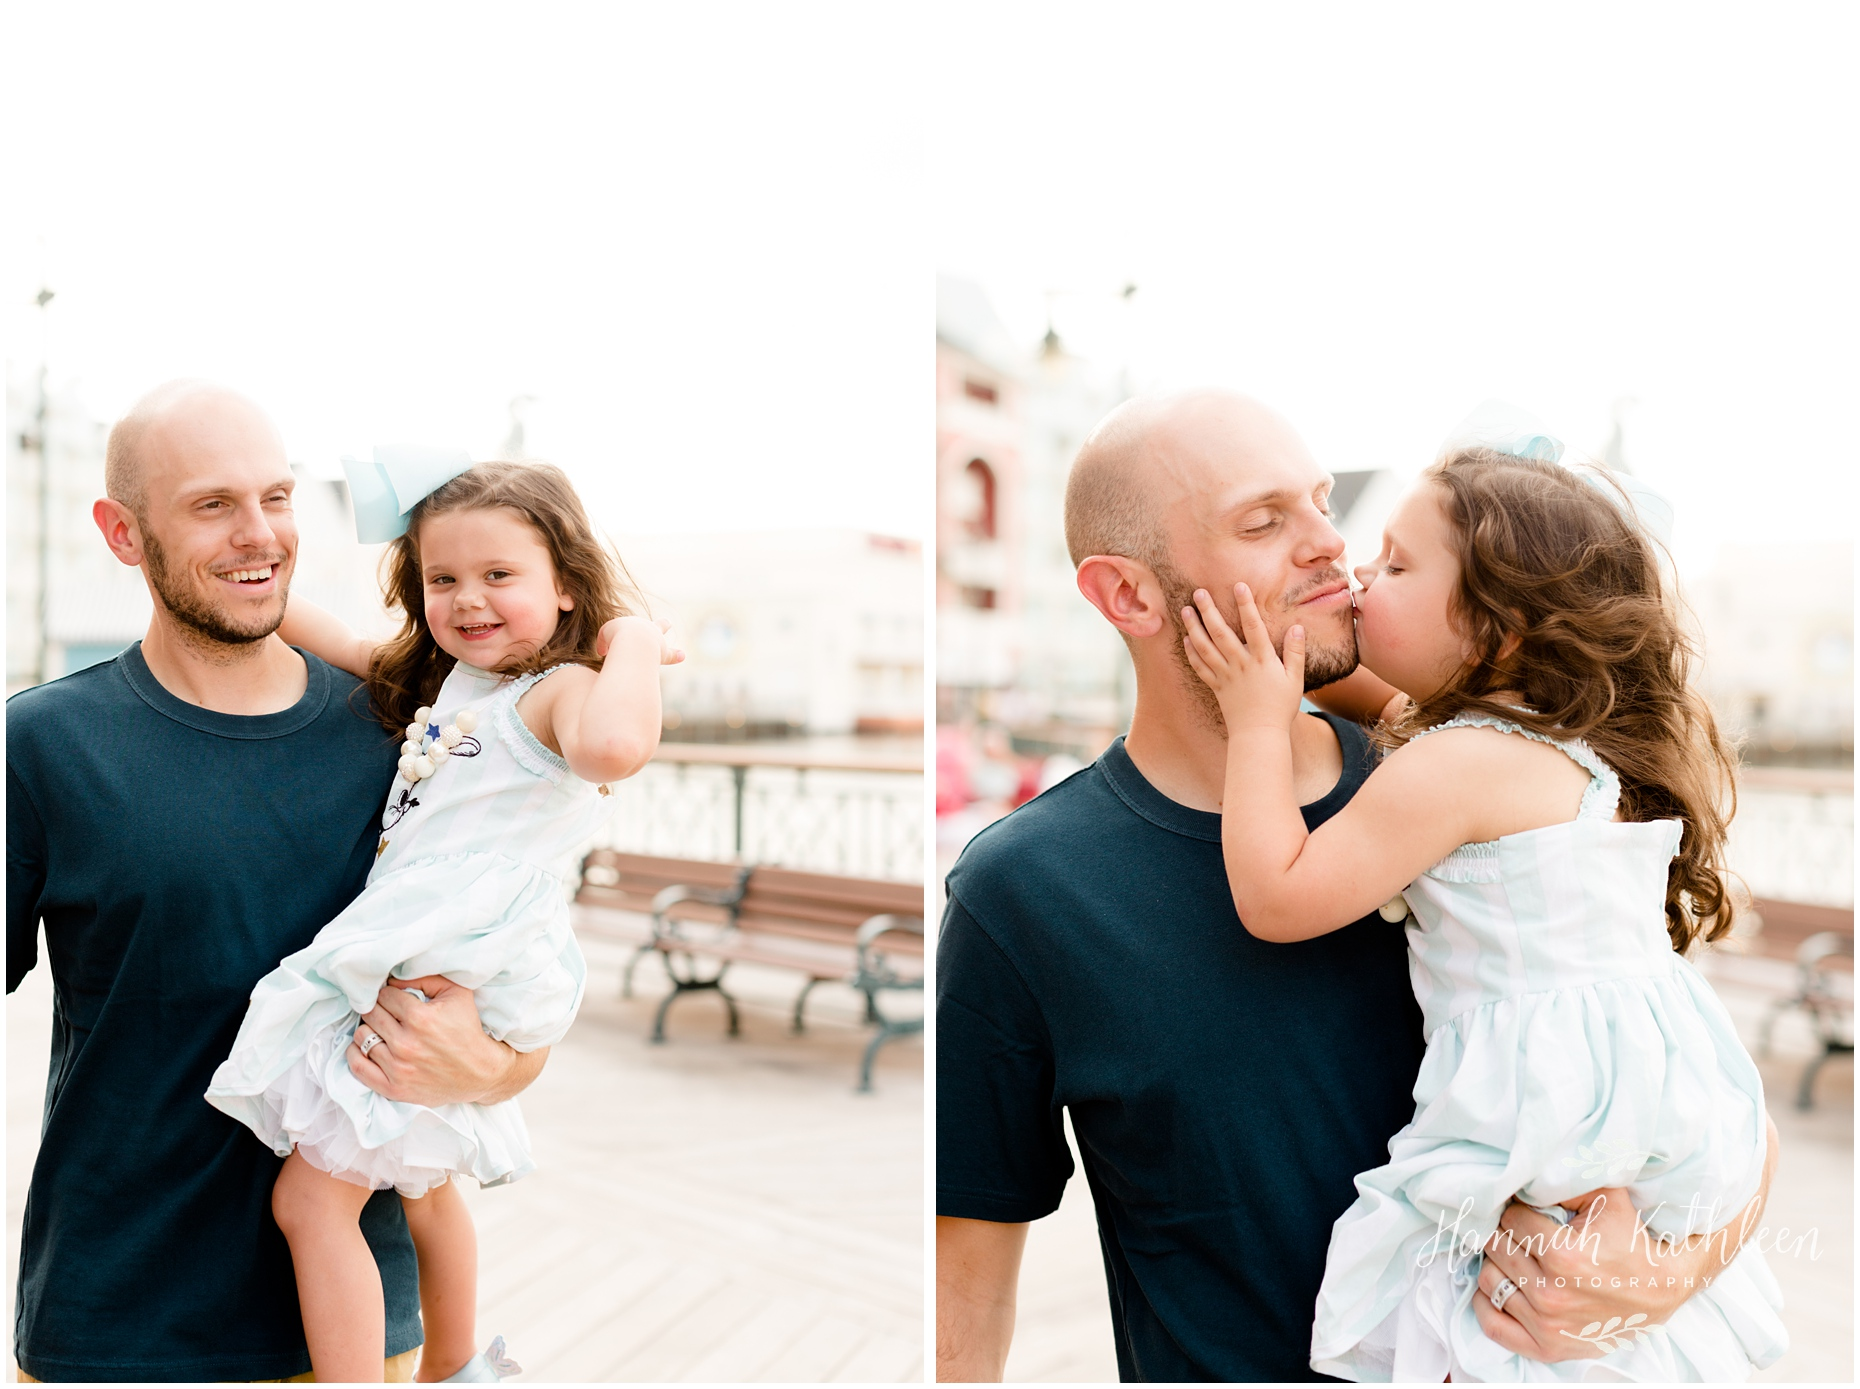 Abbott_Orlando_Central_Florida_Family_Professional_Photographer